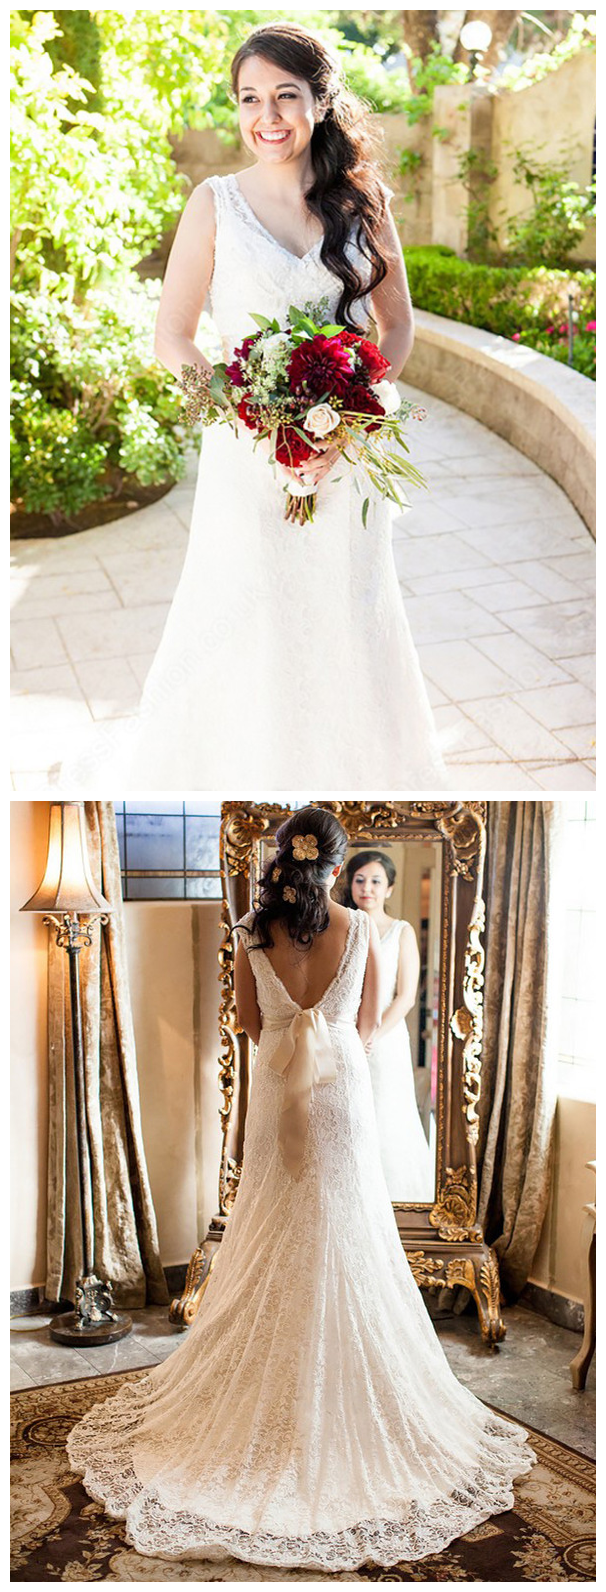 Modern lace vneck neckline chapel train sheath wedding dresses with